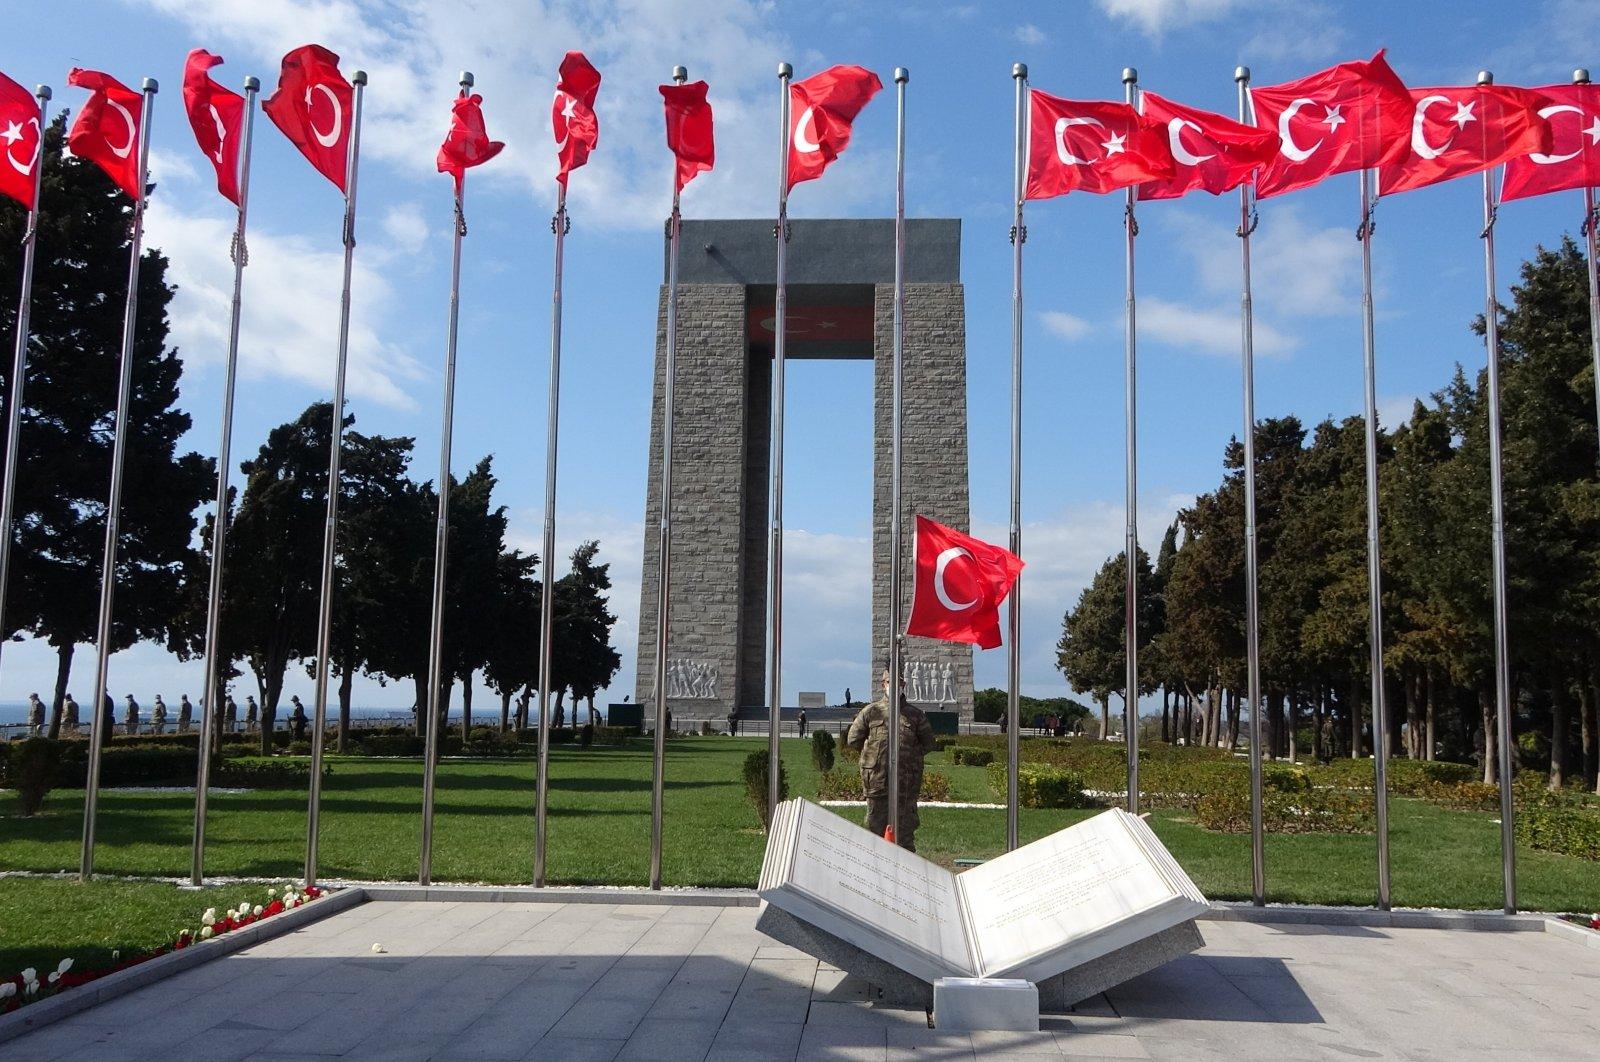 Martyr's Memorial is seen behind Turkish flags, Çanakkale, northwestern Turkey, March 18, 2021. (İHA Photo)